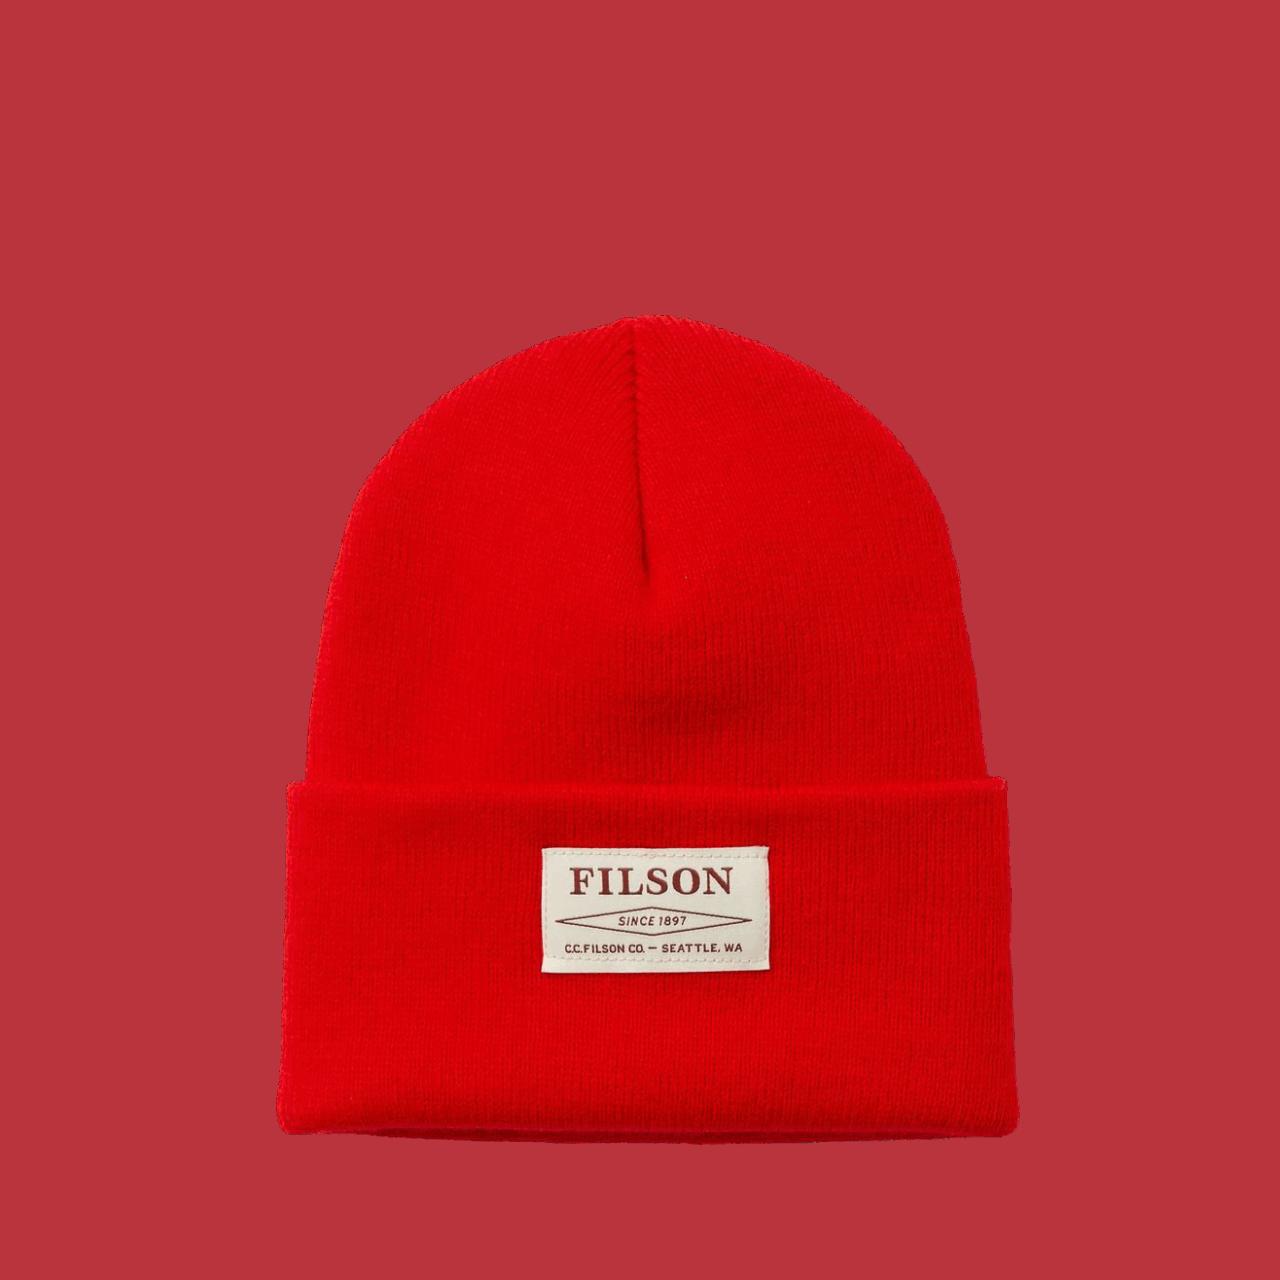 Filson Acrylic Watch Cap - red